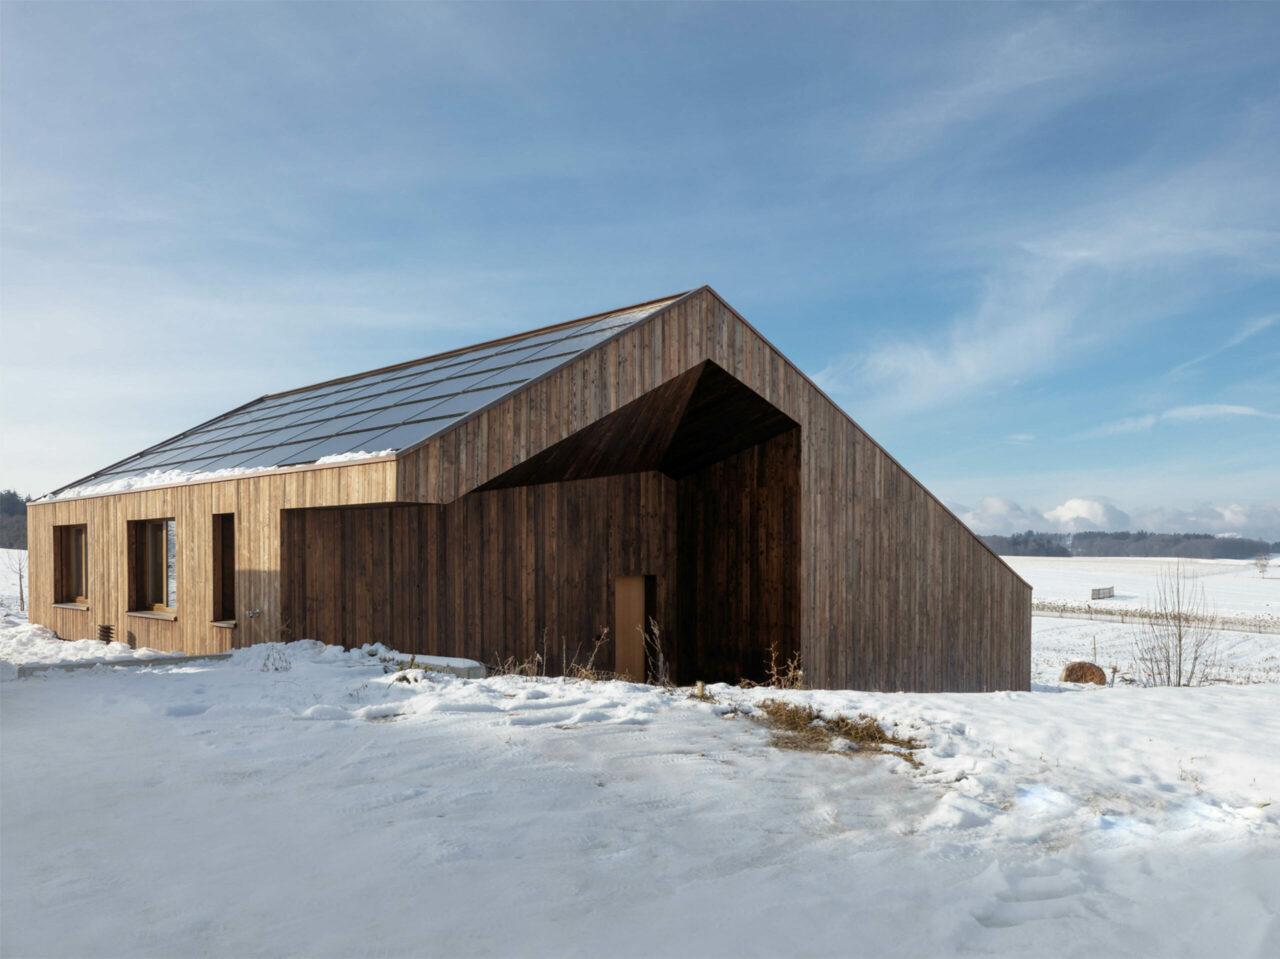 Murist maison individuelle zéro énergie